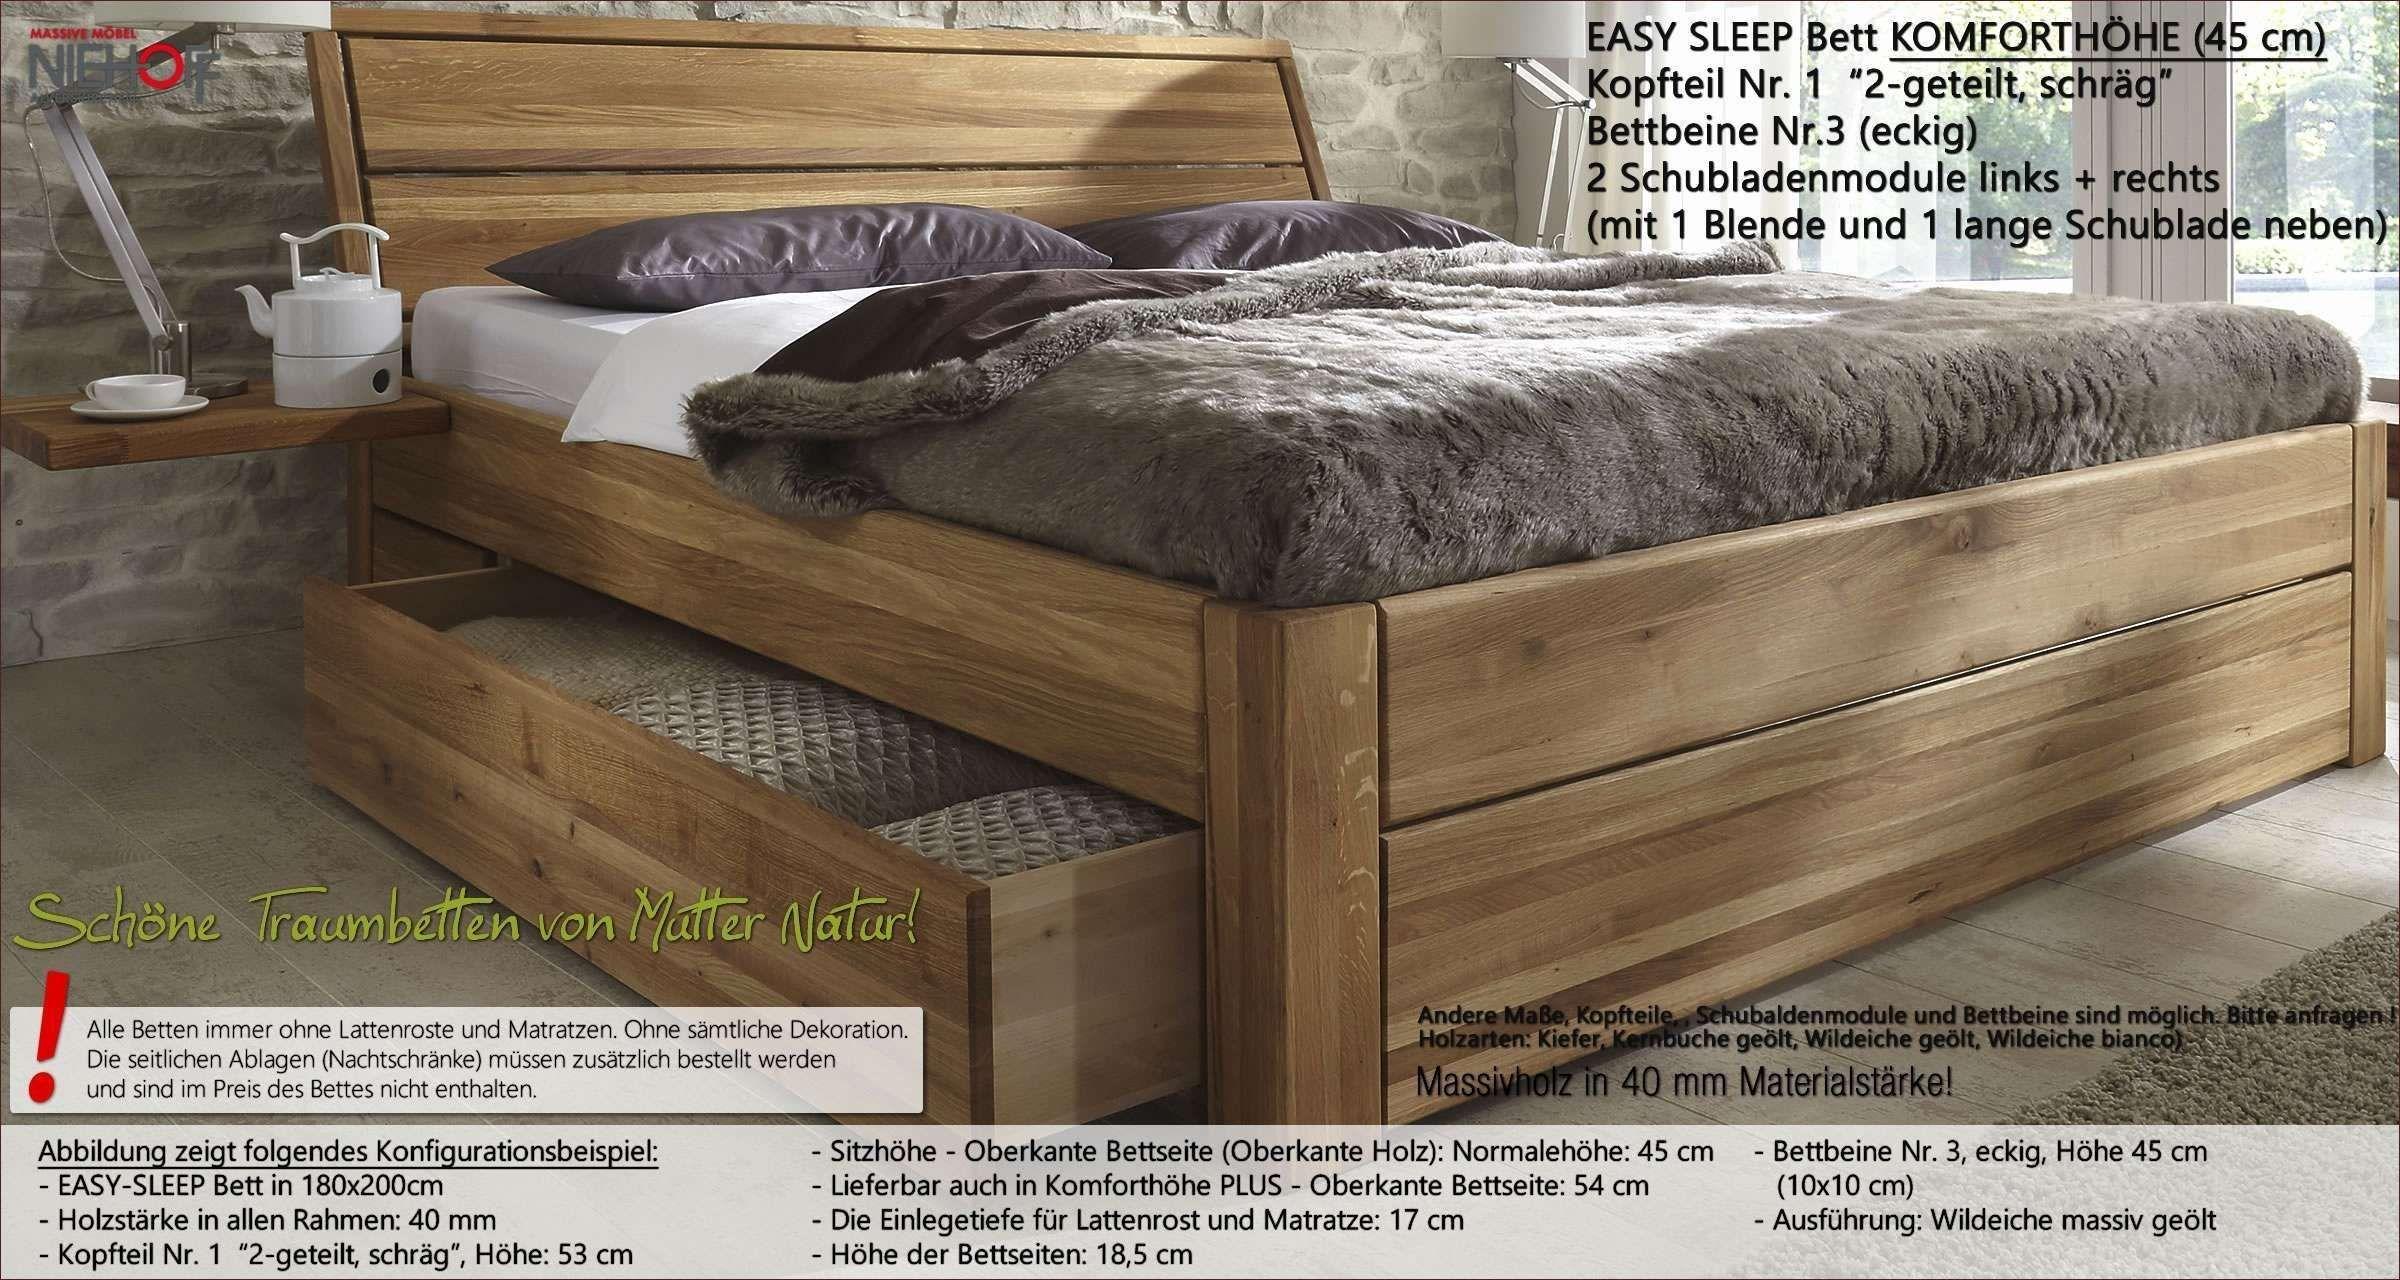 Kopfteil Bett 180 Cm Kopfteil Bett 180 Bedroom Design Furniture Home Decor